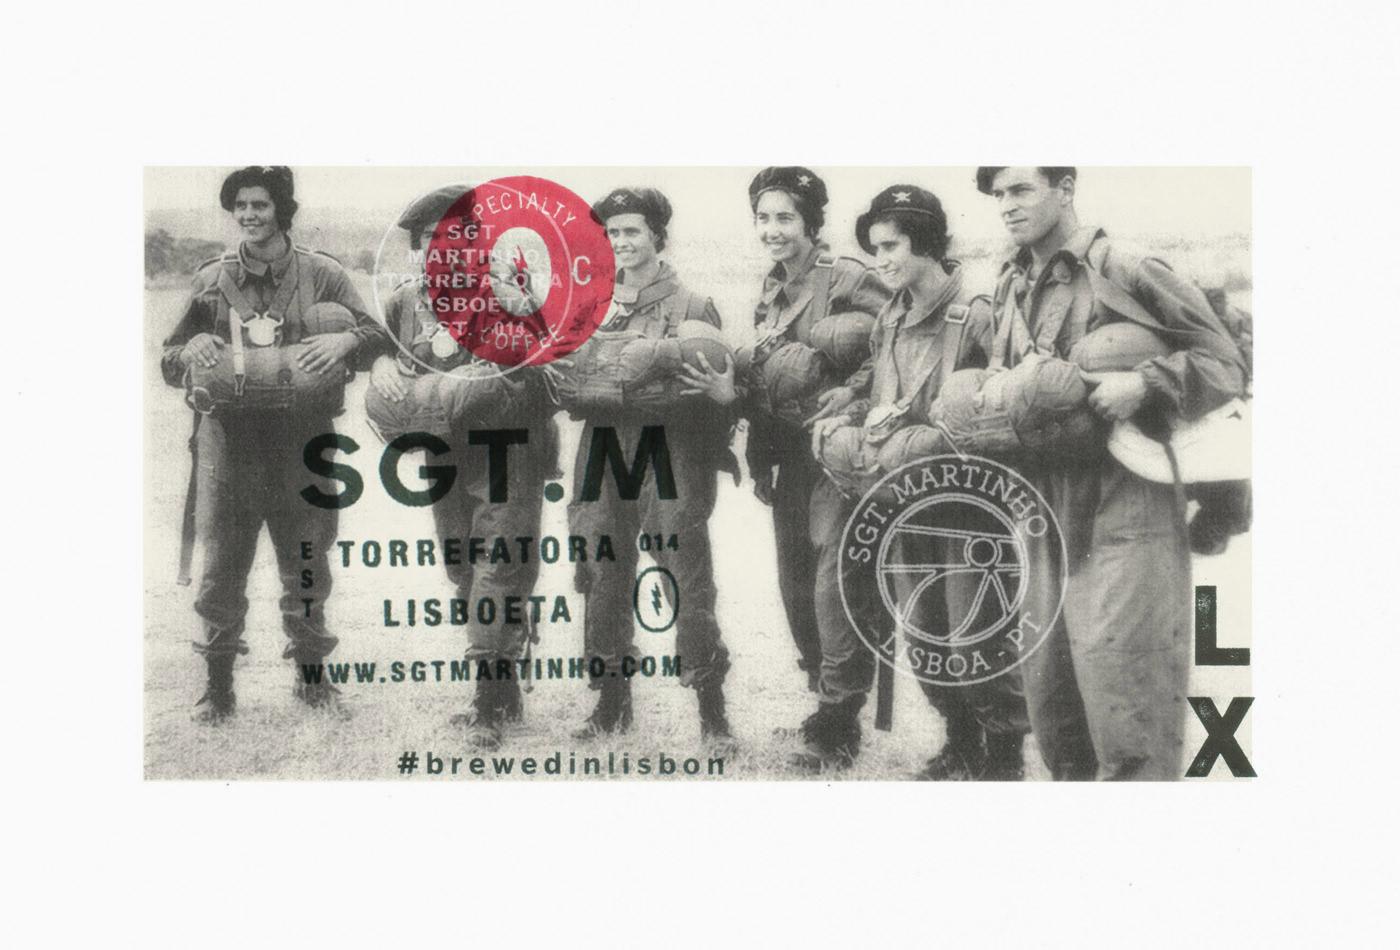 sgtm-sargento-martinho-coffee-brand-marks-logo-branding-identity-vacaliebres-voo